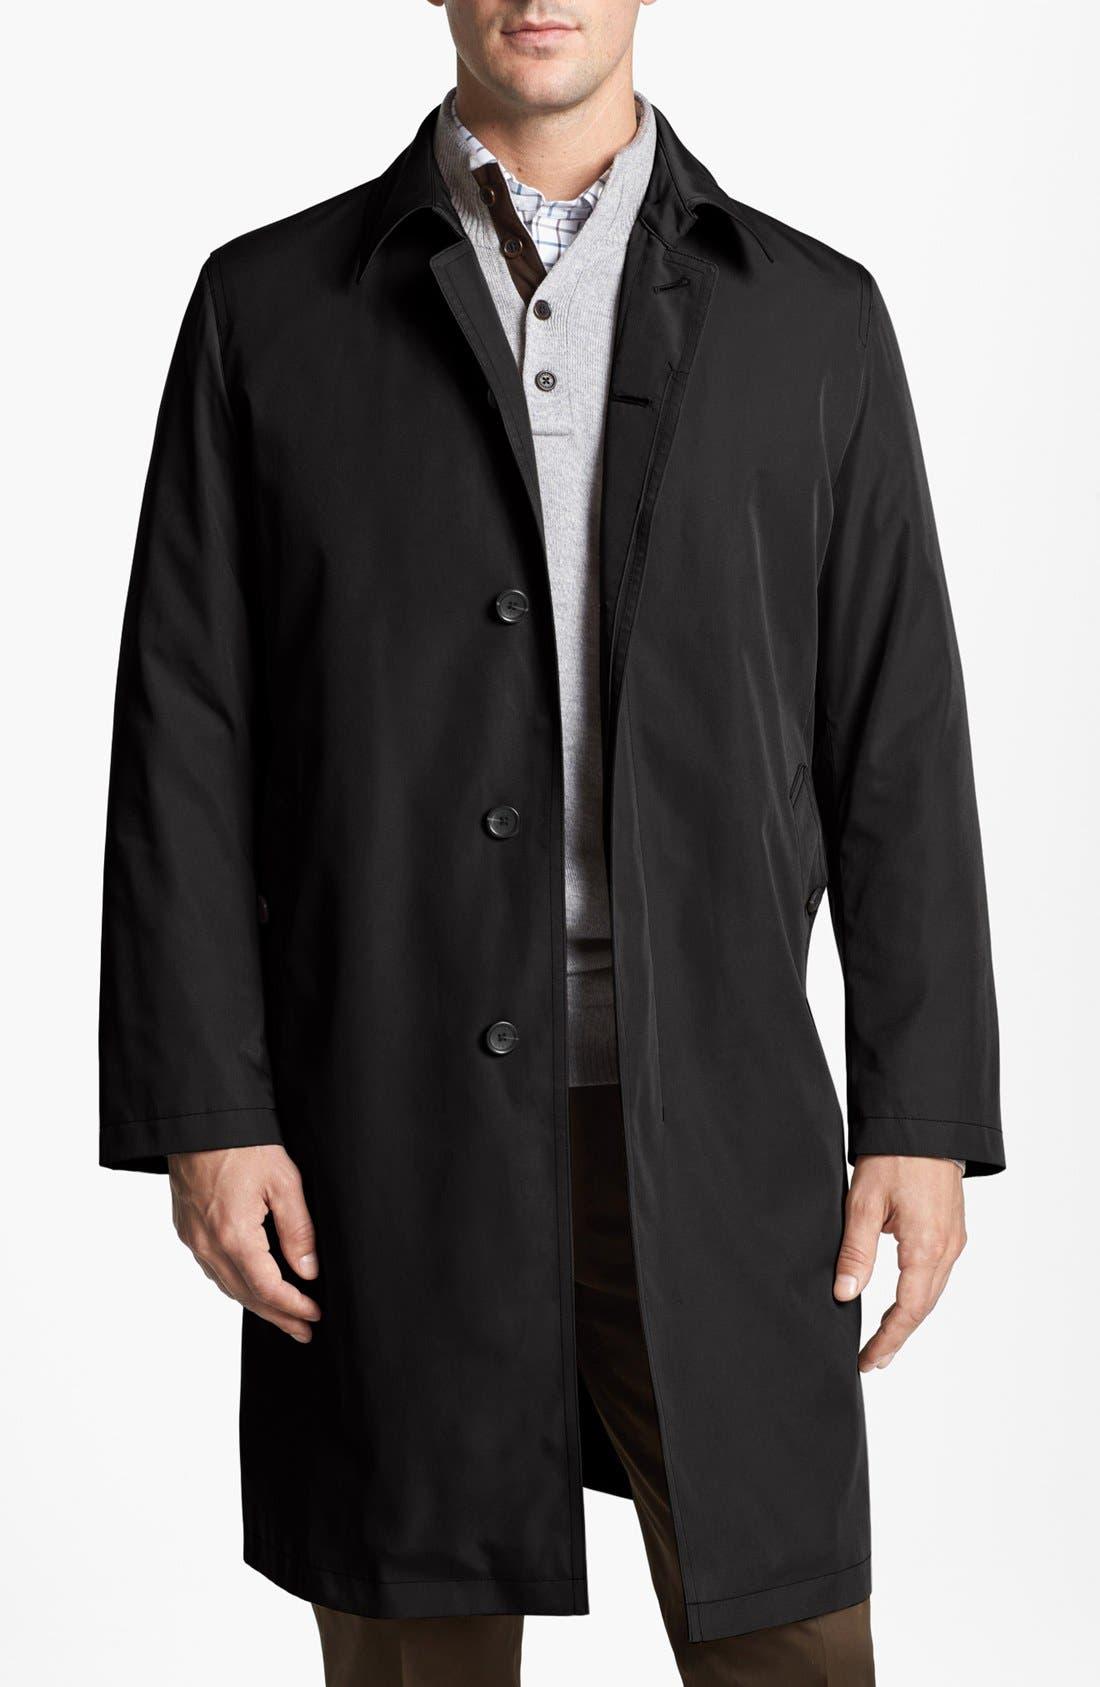 SANYO 'Grays' Car Coat, Main, color, 009